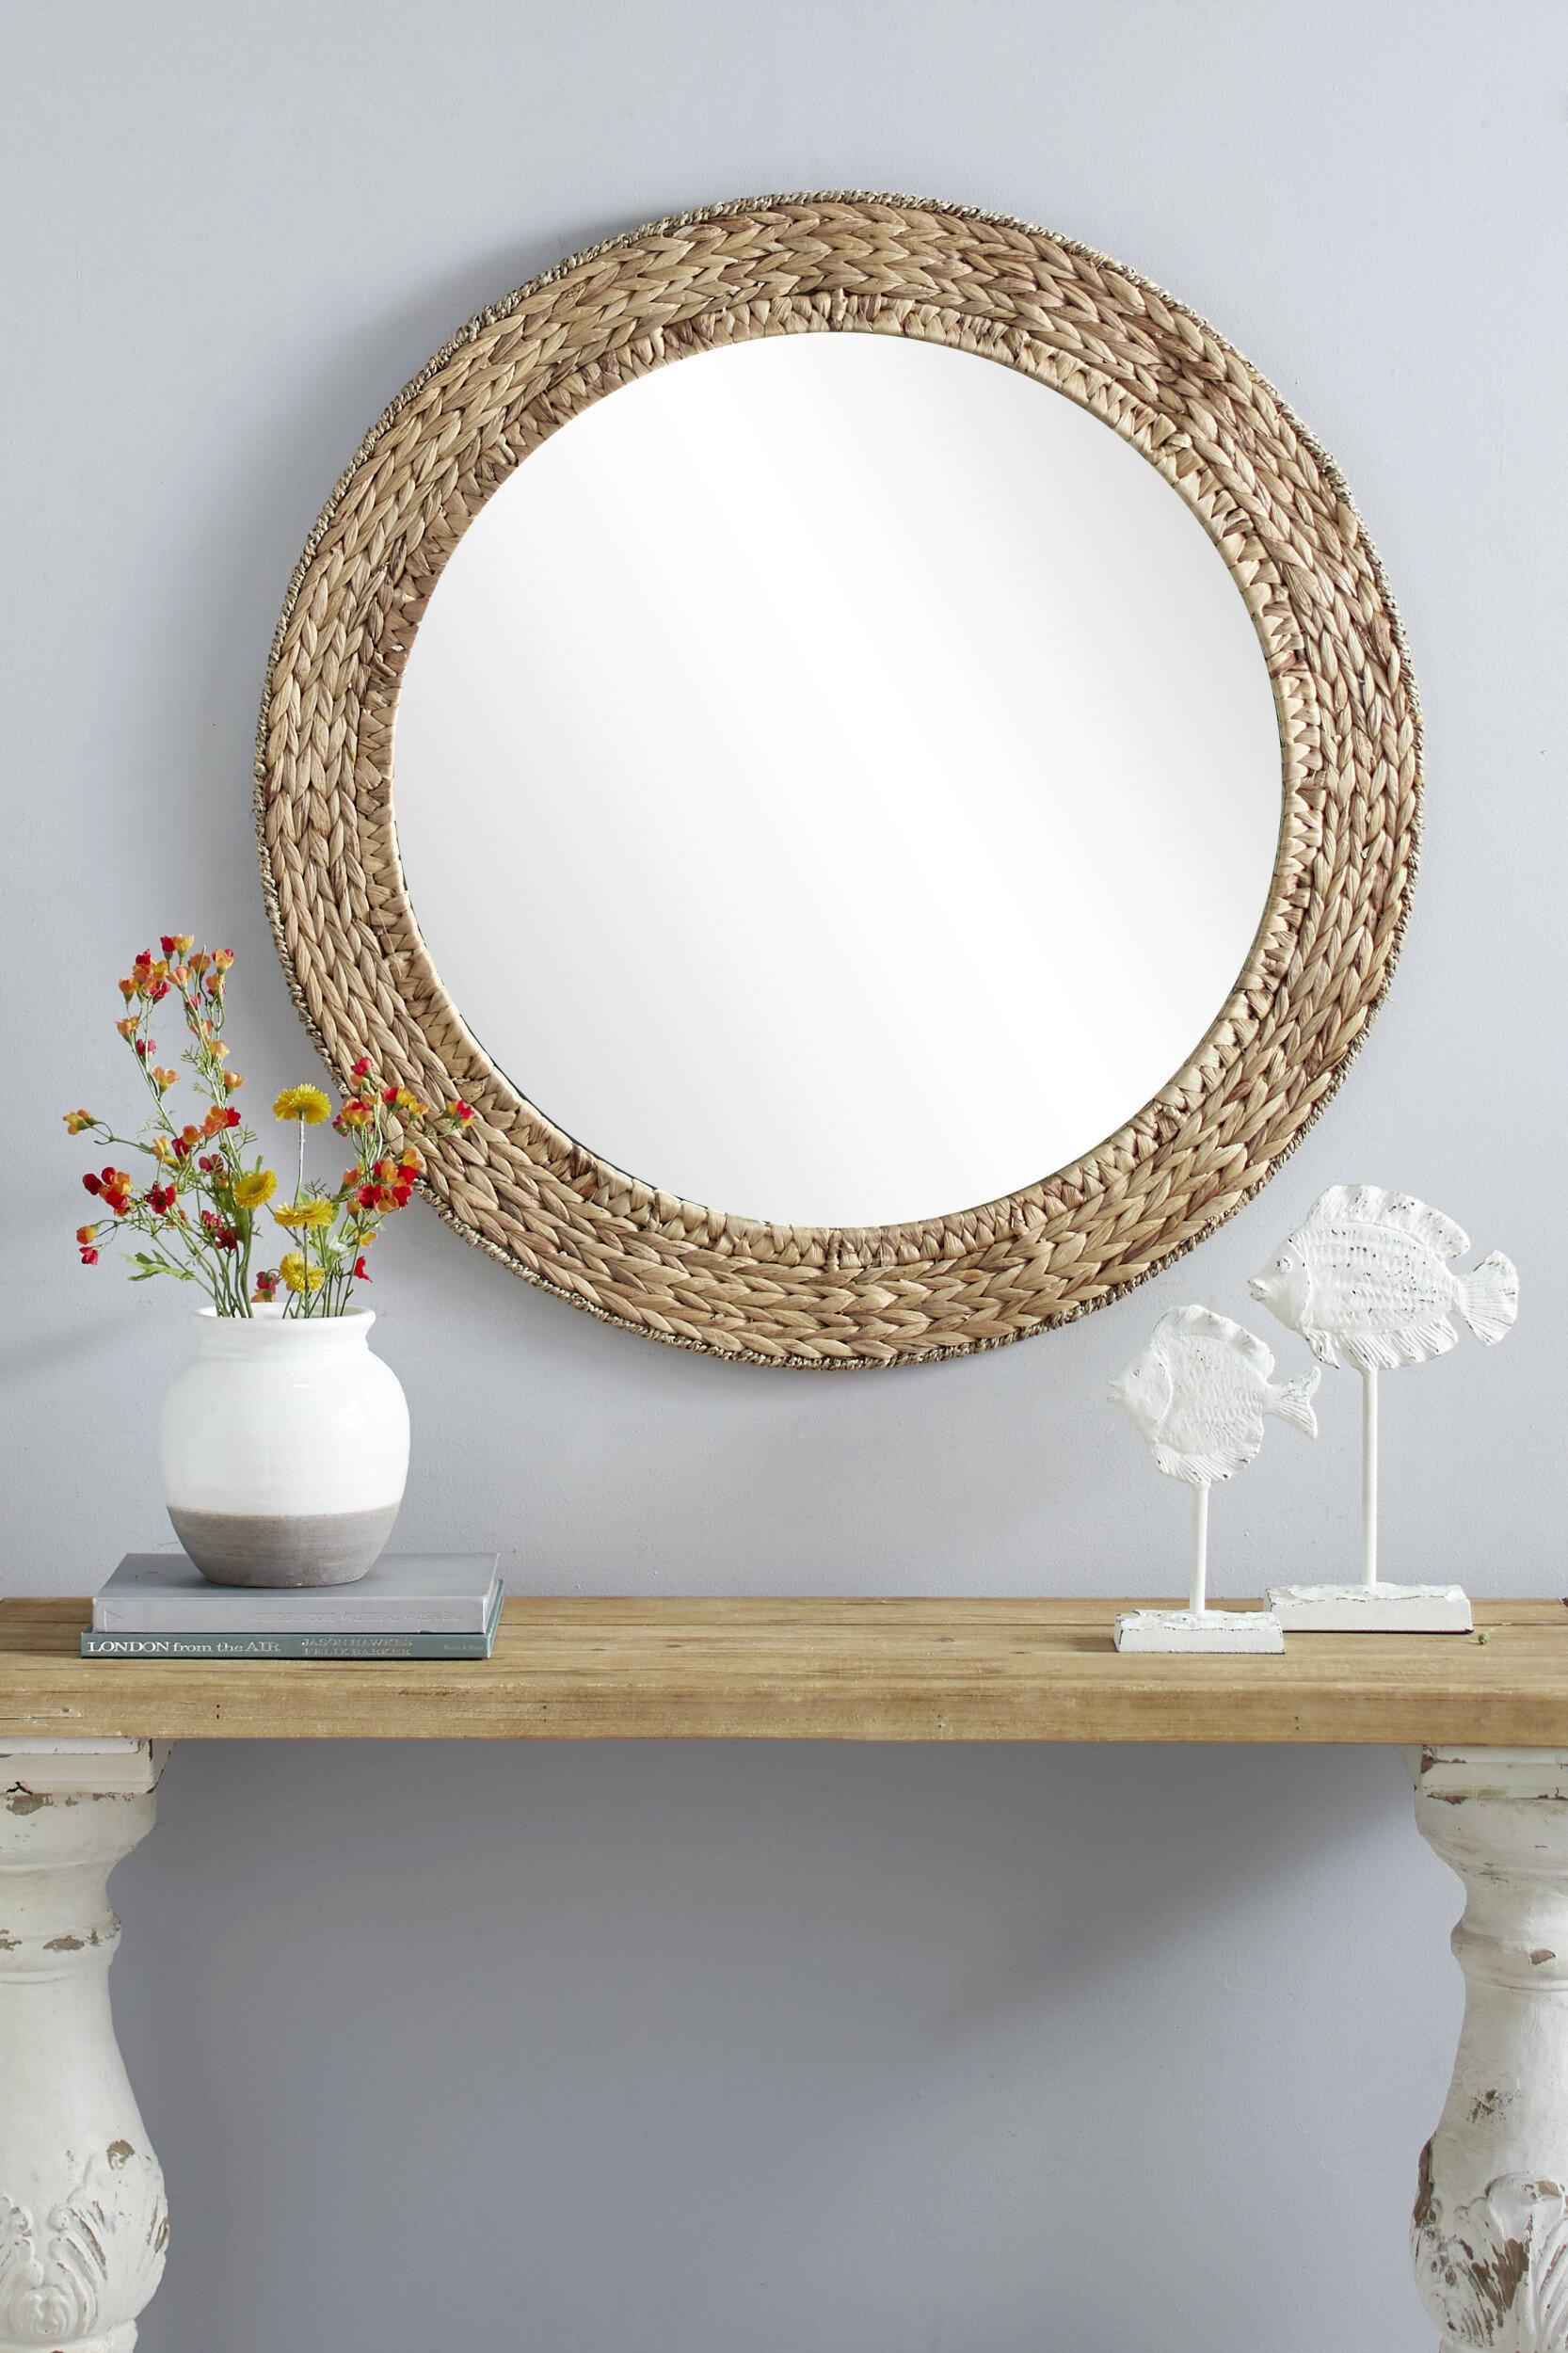 Chiara Round Handmade Wicker Rustic Accent Mirror Regarding Mcnary Accent Mirrors (View 9 of 20)